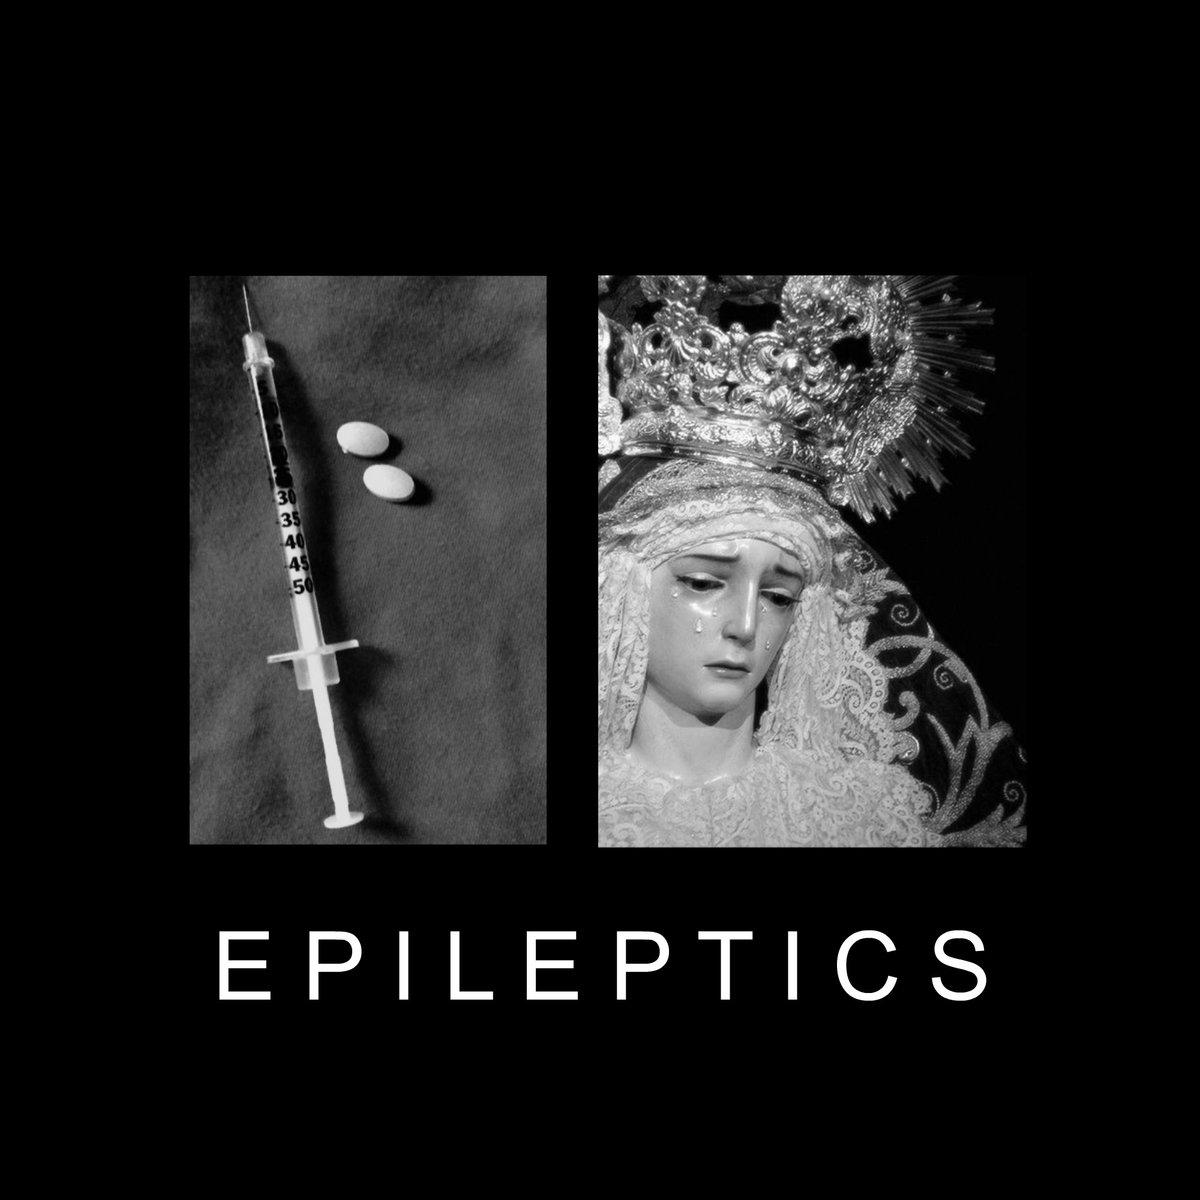 Epileptics - Epileptics